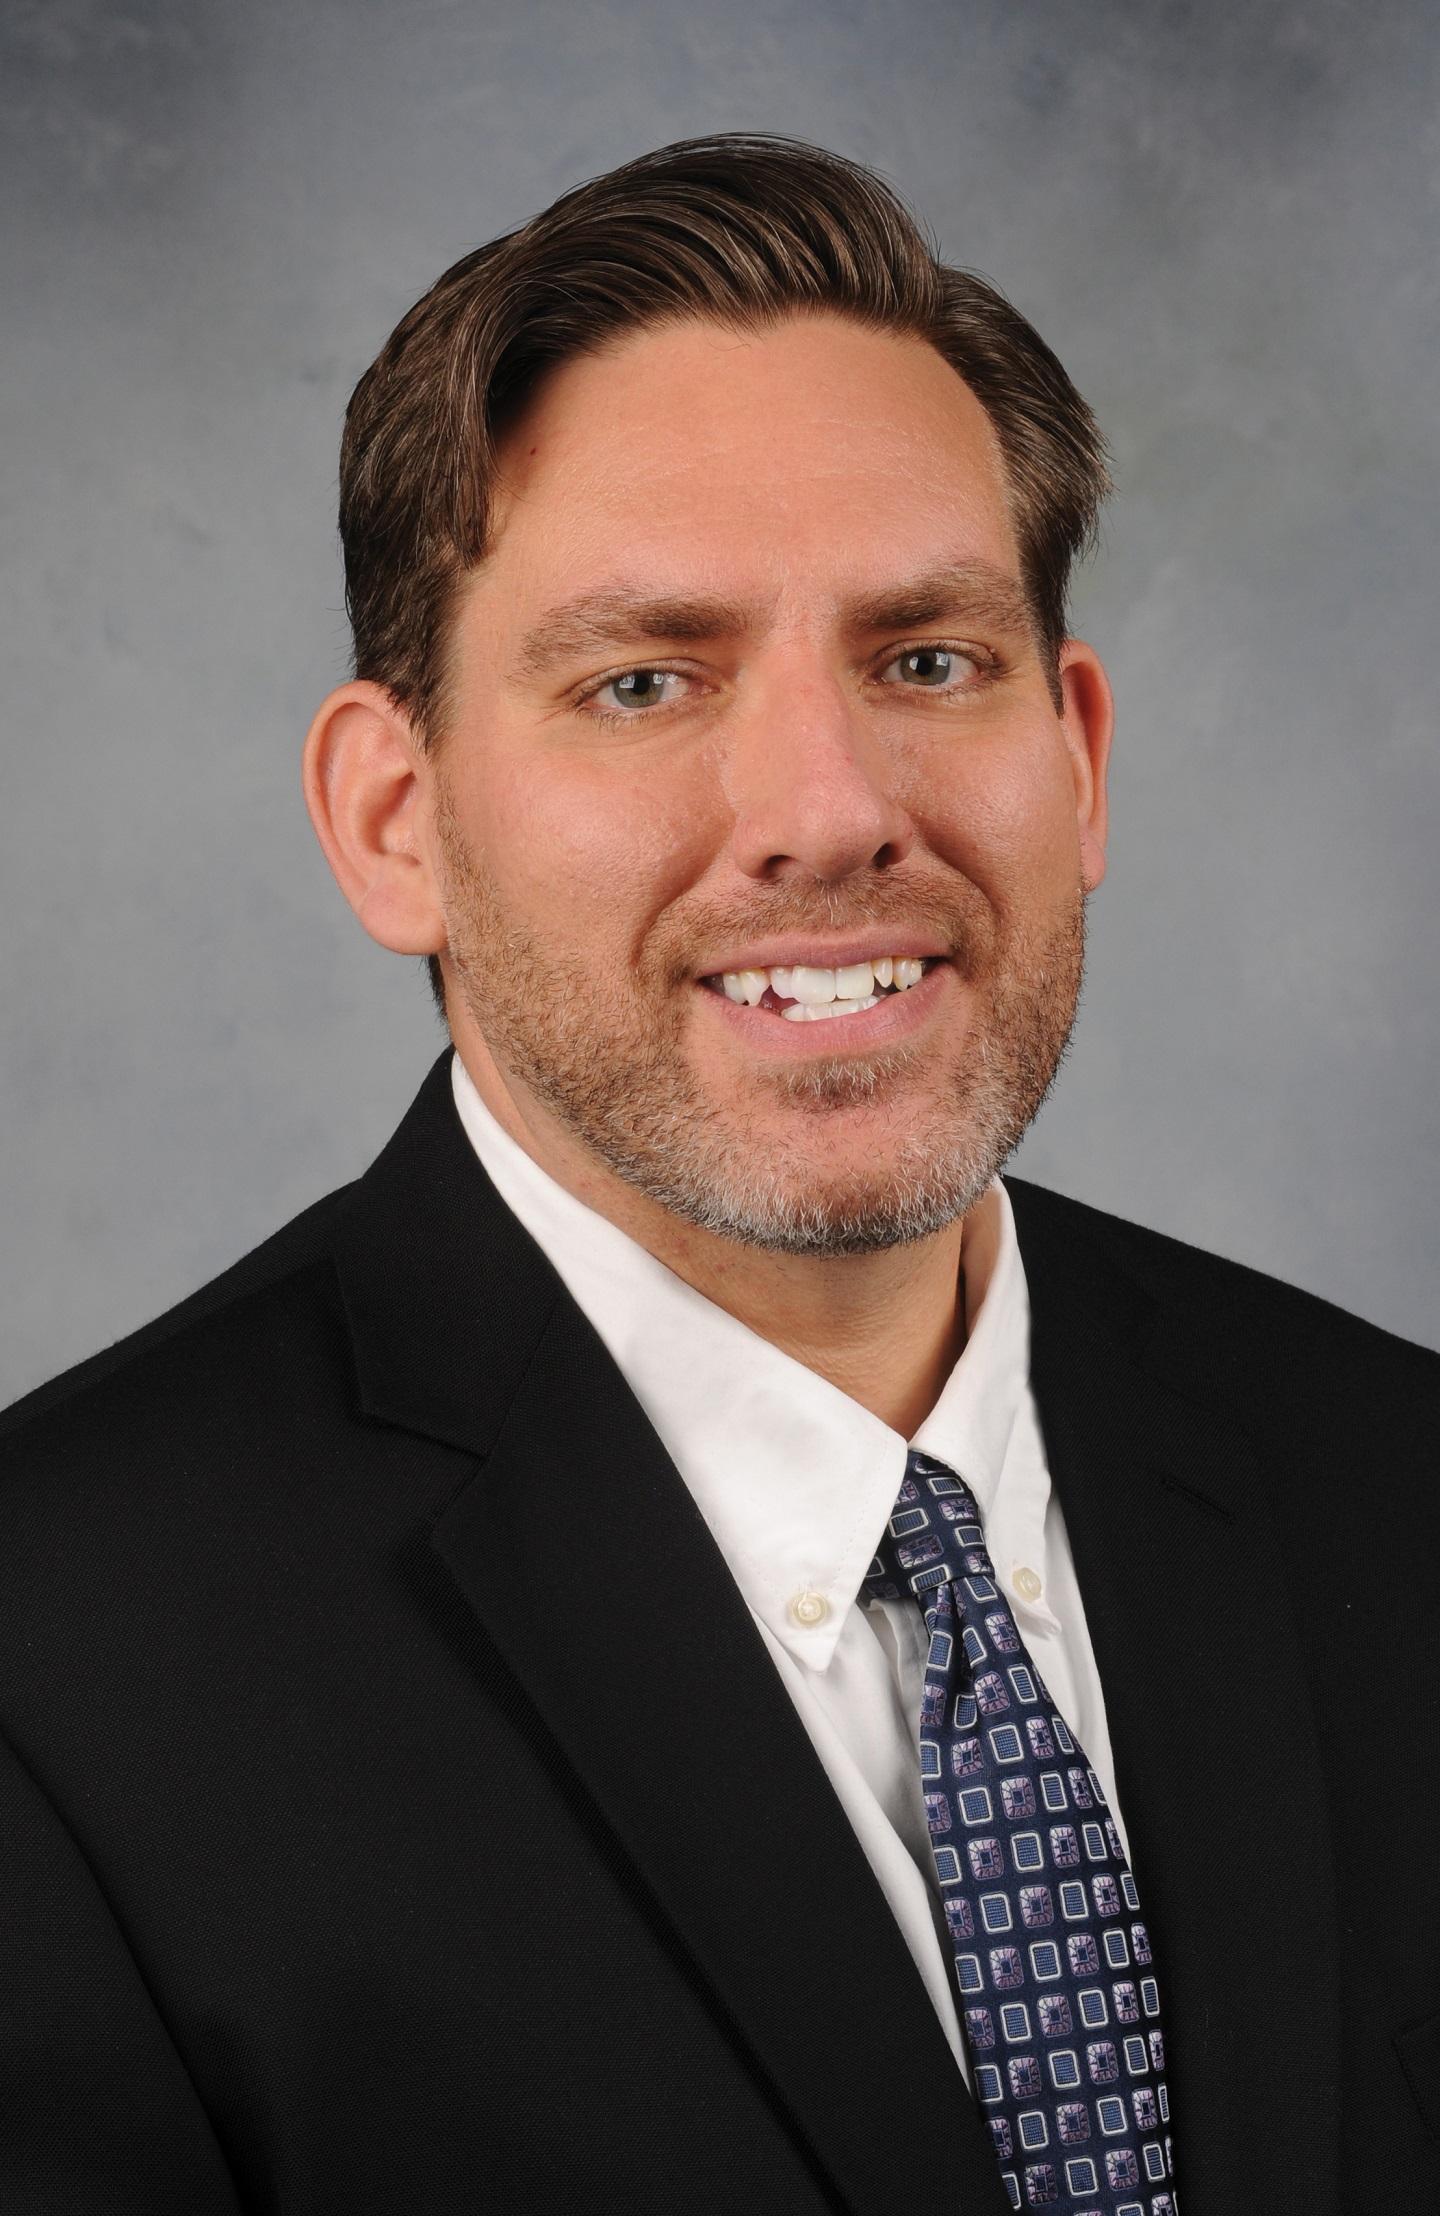 Jason Hackett